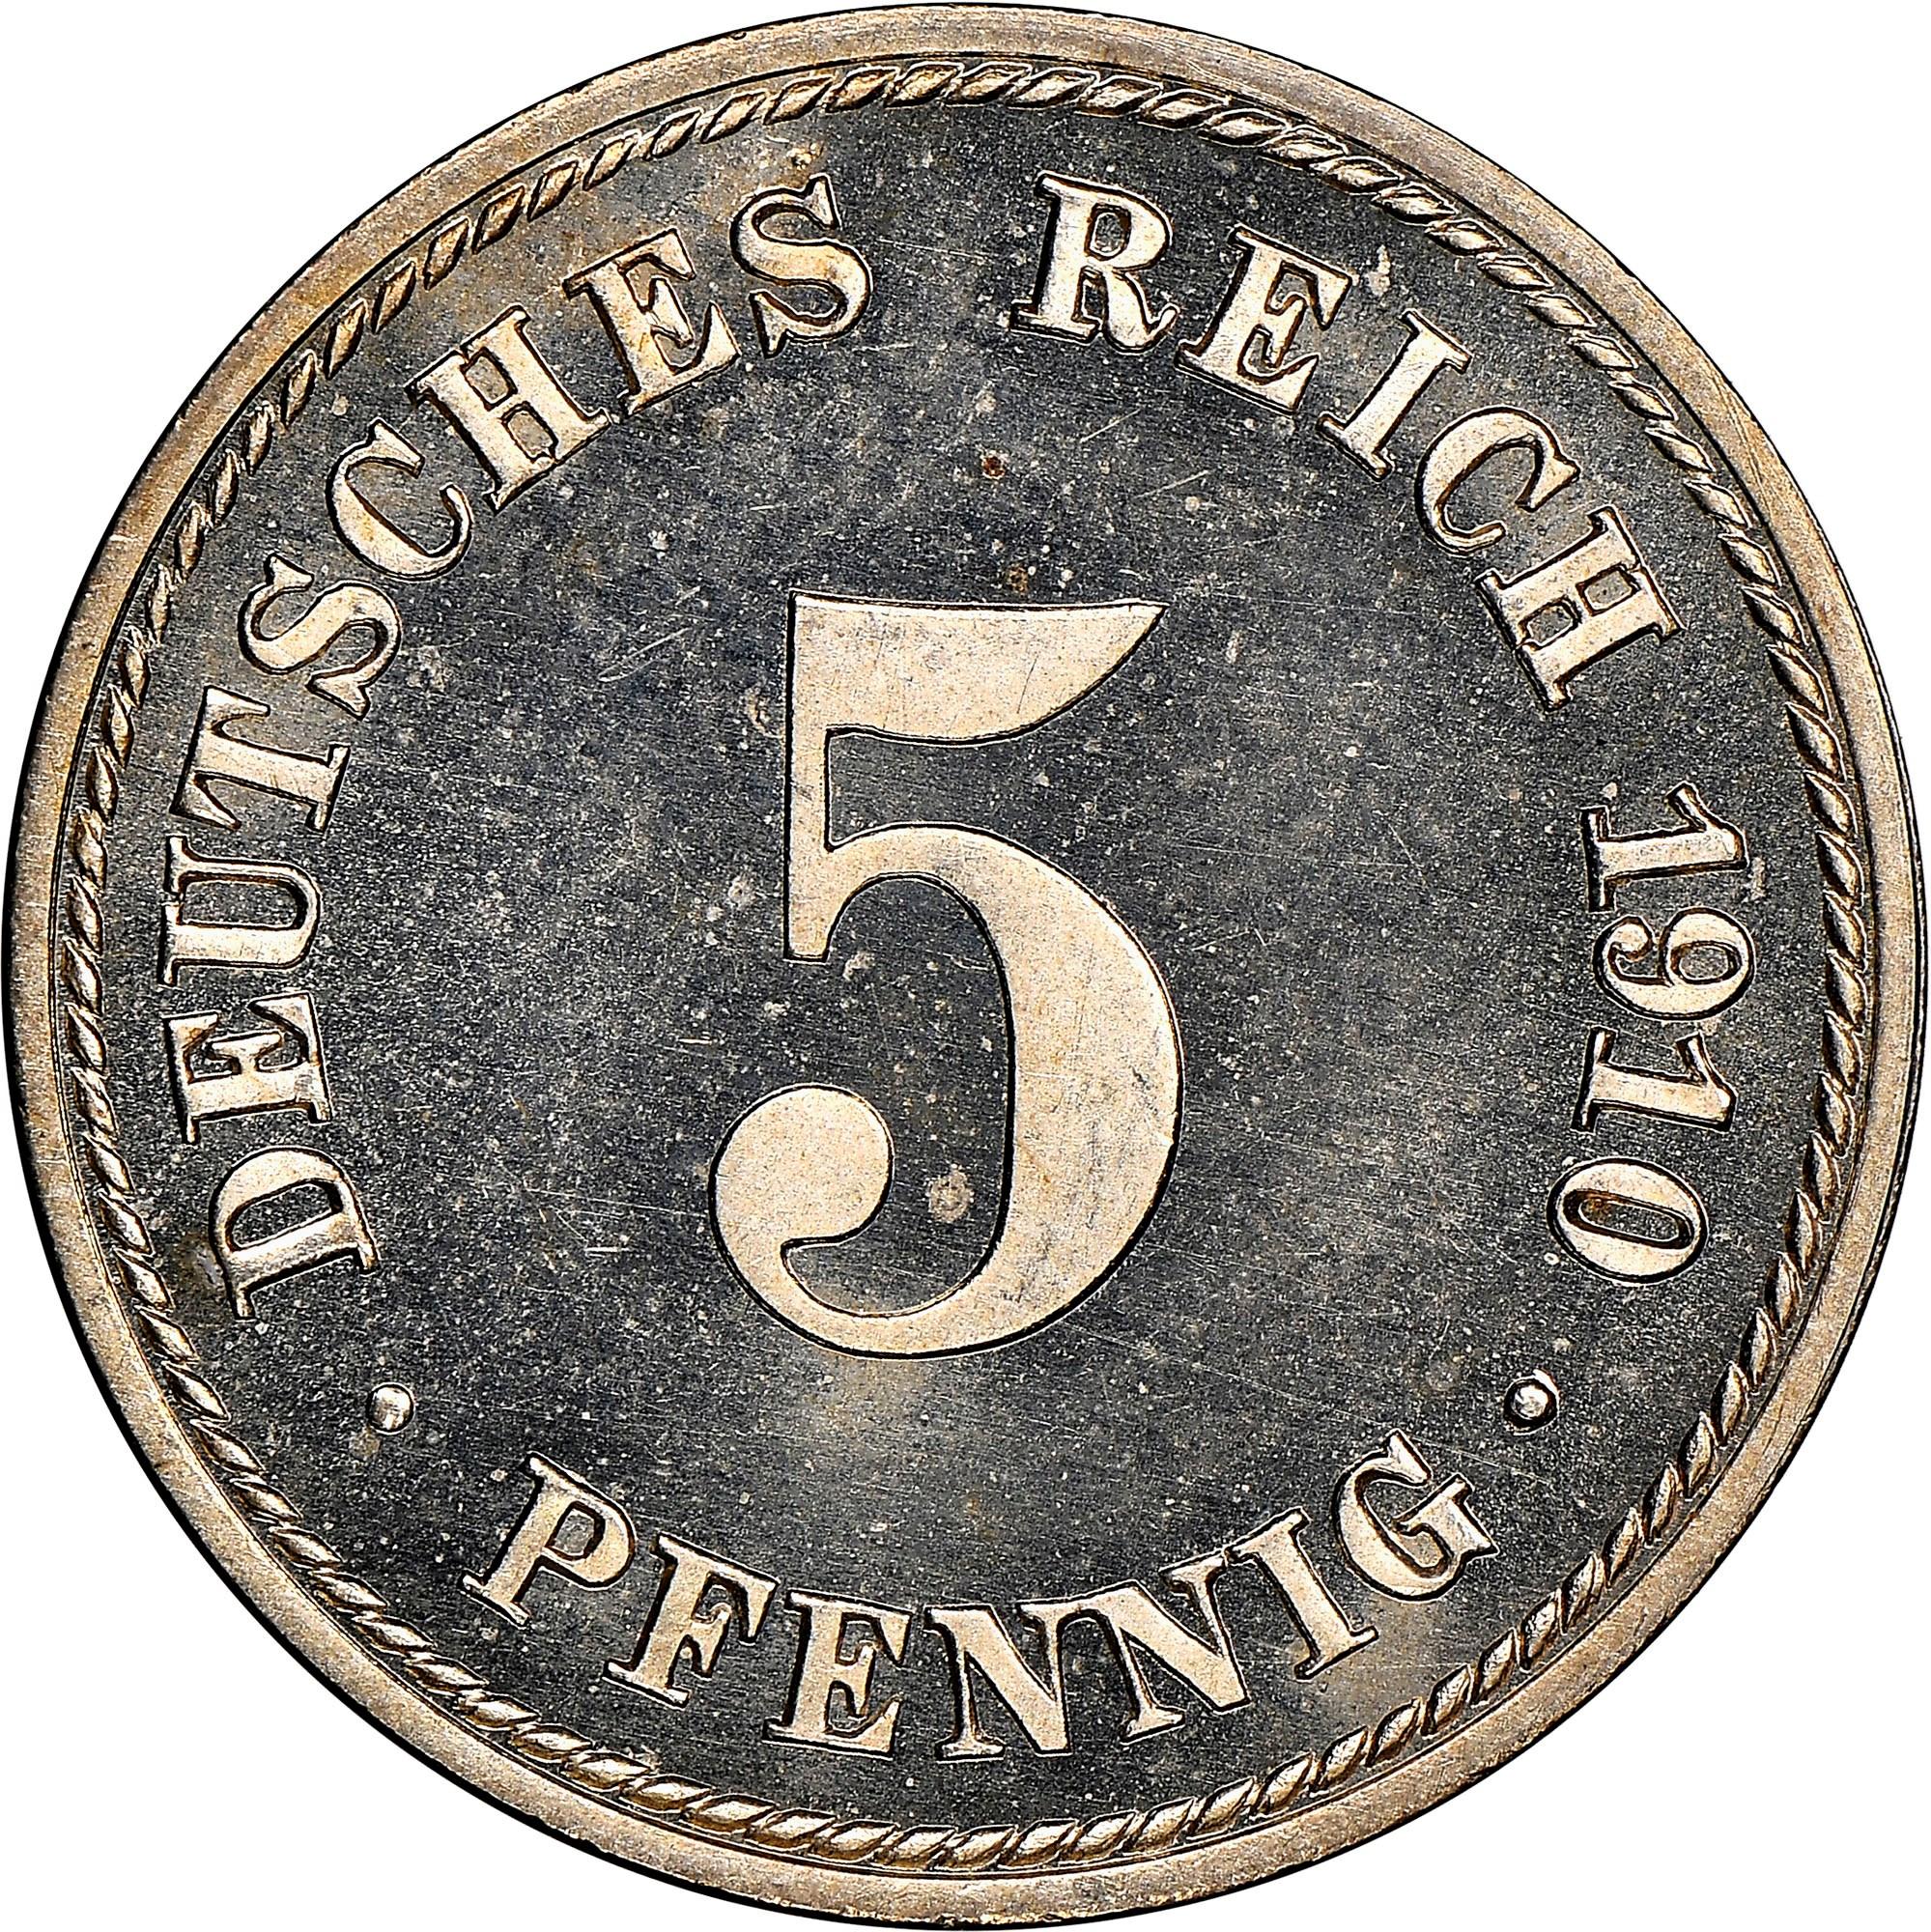 Germany - Empire 5 Pfennig obverse